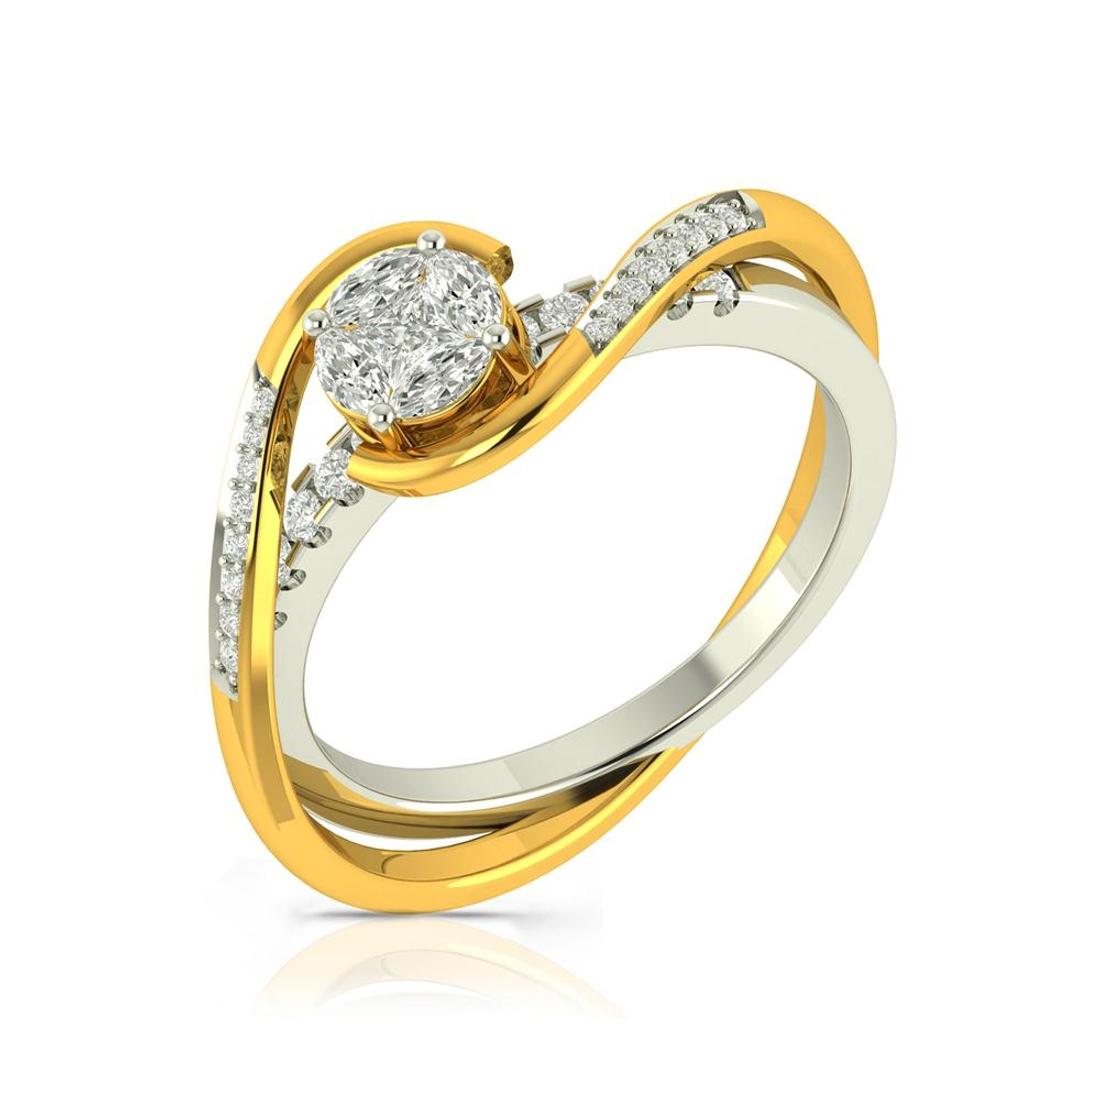 Buy Charu Jewels Diamond Ladies Ring CJLR0686 Online in India